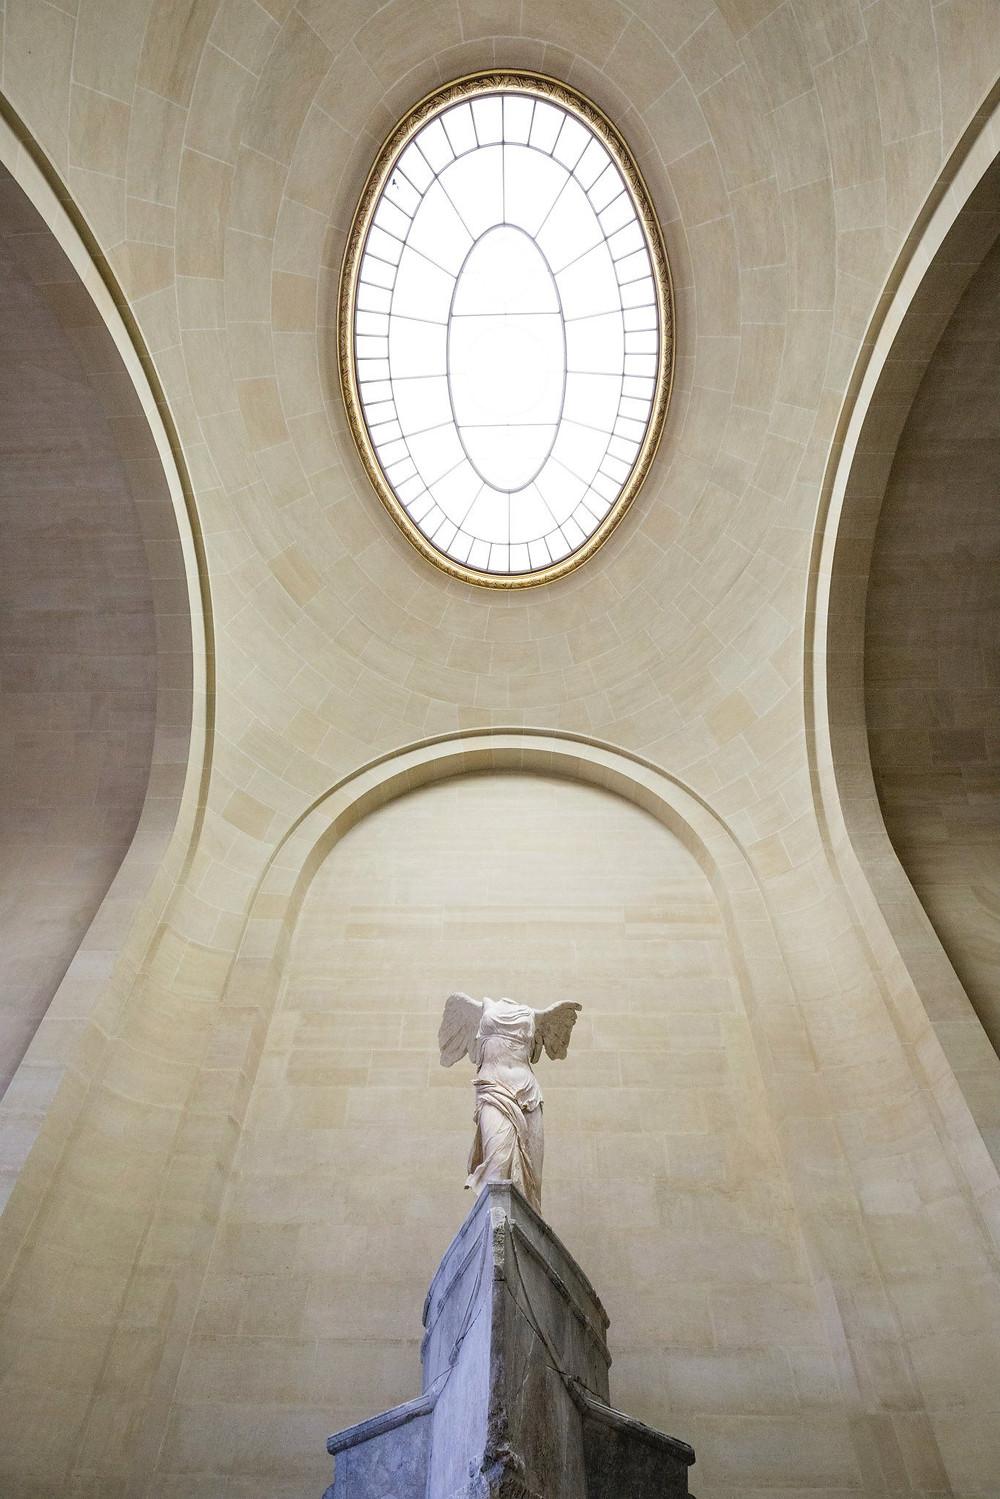 Winged Victory of Samothrace, Greek goddess, statue, Louvre, art sculpture, museum, dreamer, photography, Paris